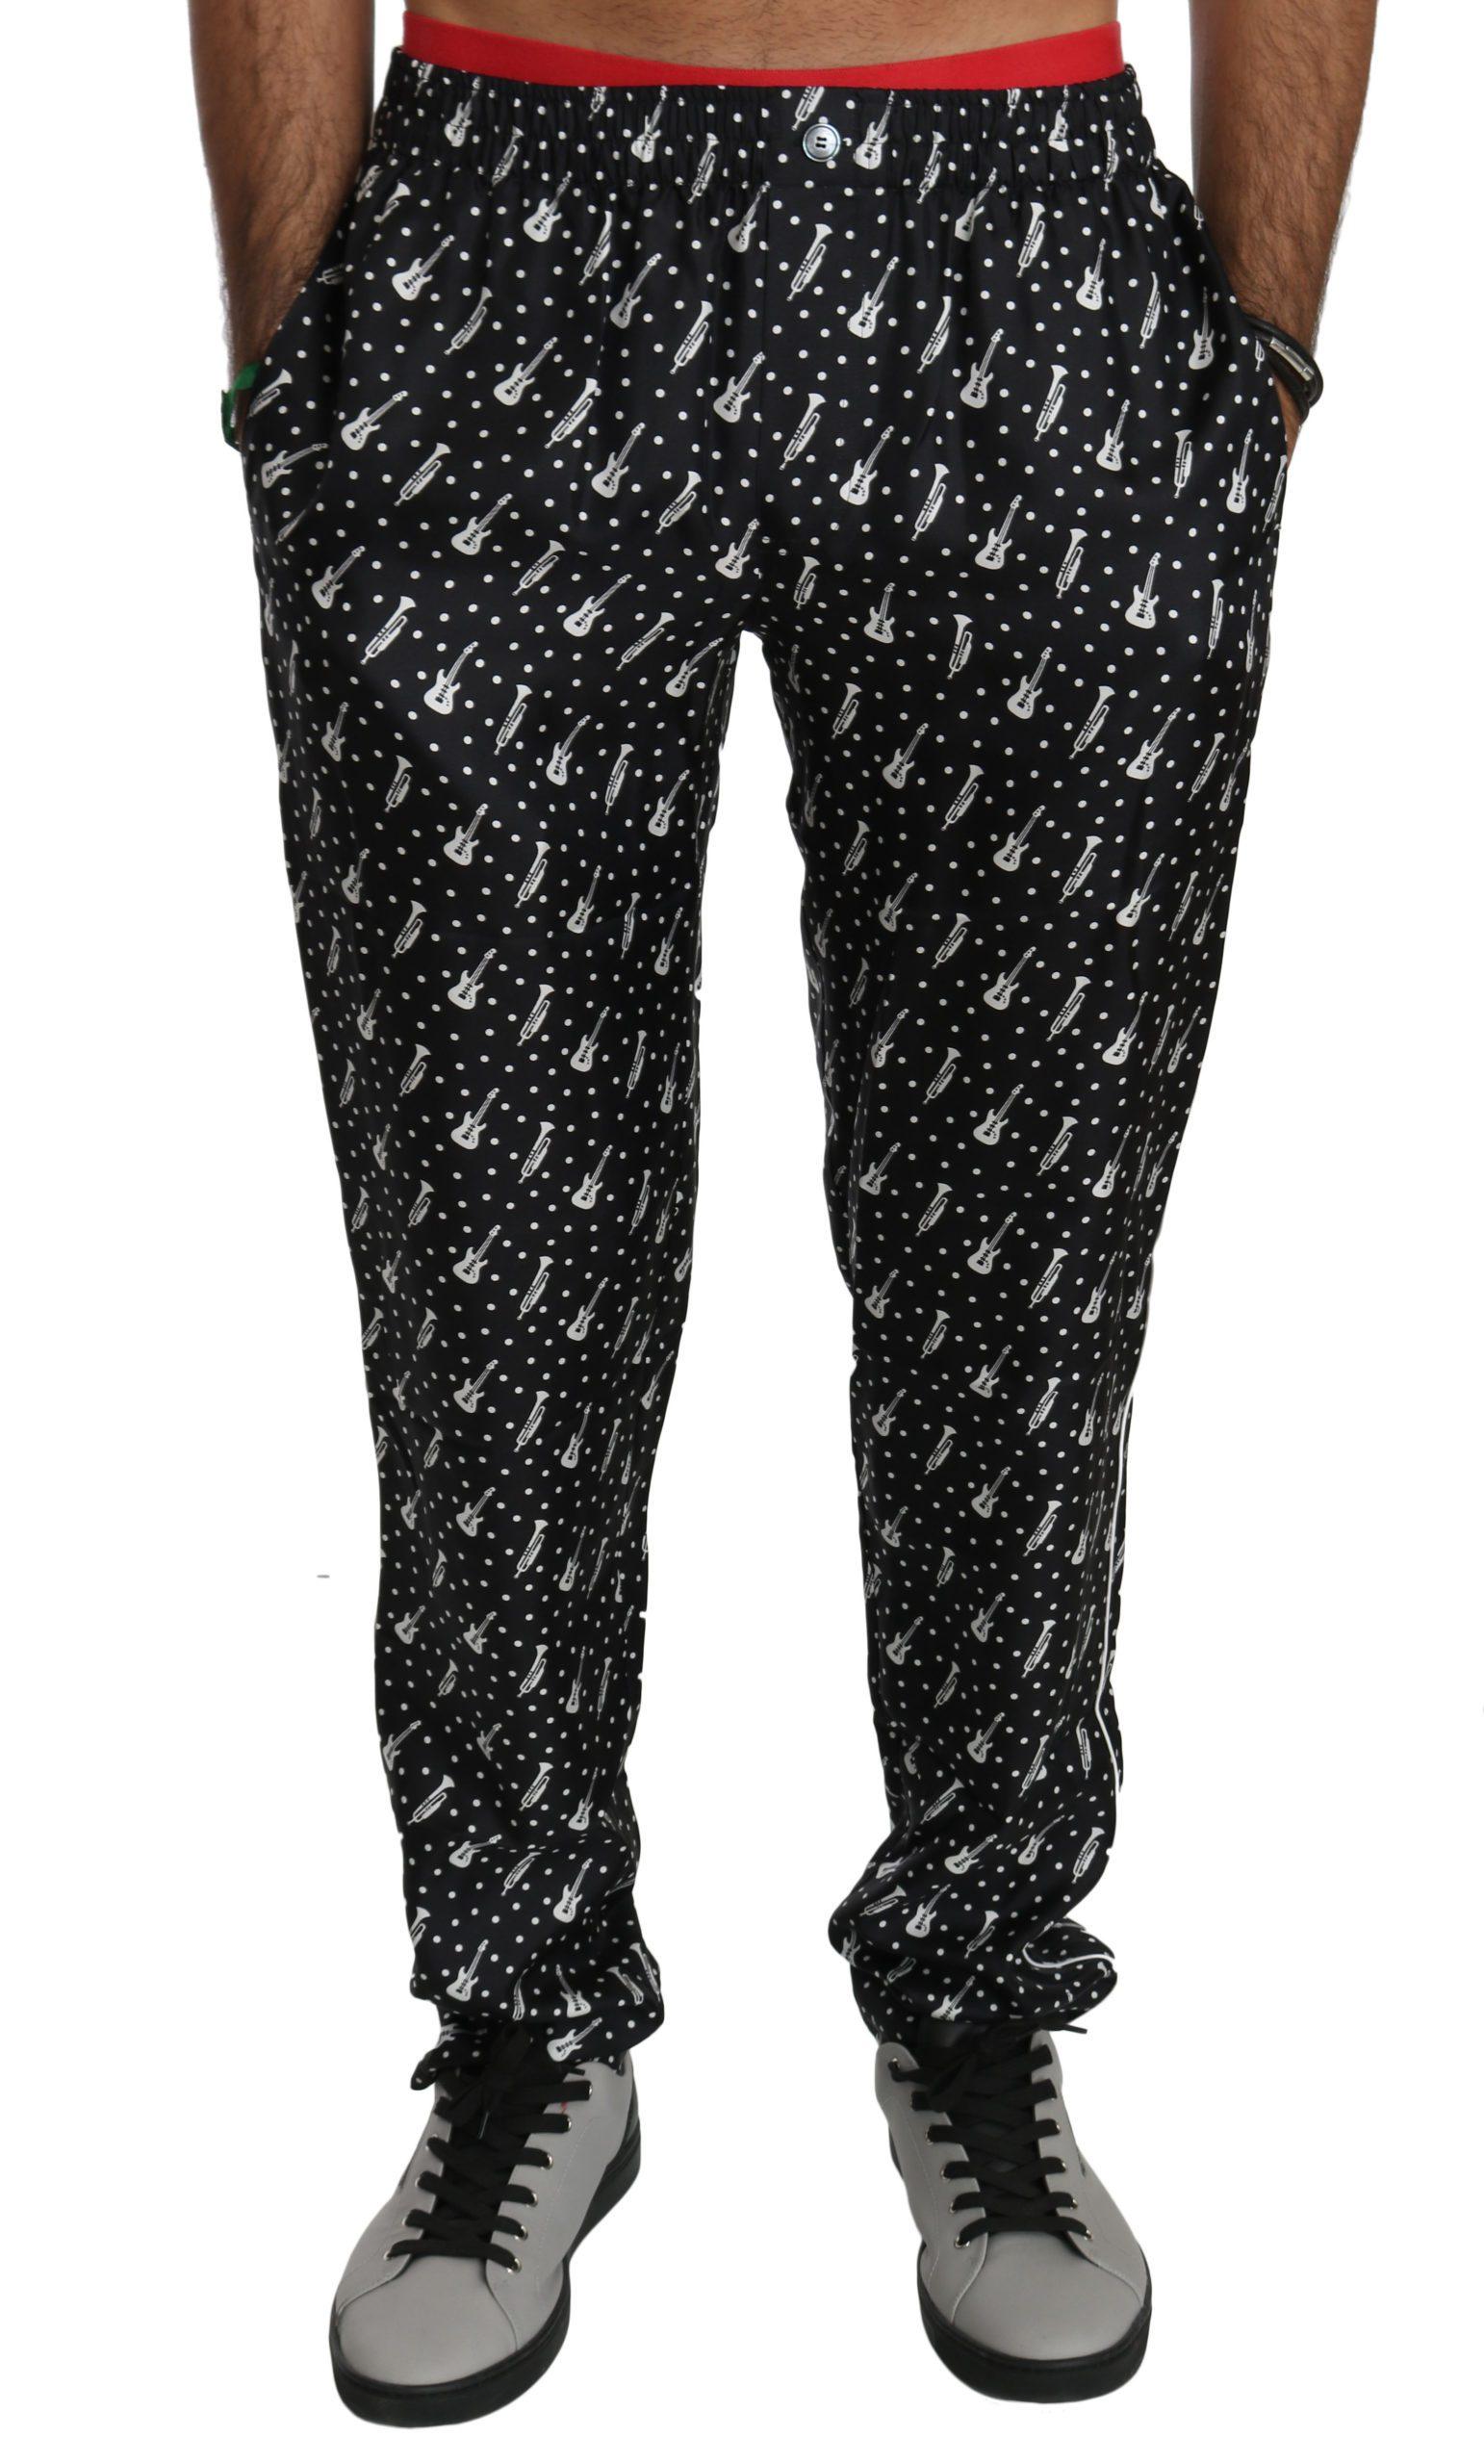 Dolce & Gabbana Men's Musical Instrument Trouser Black PAN70750 - IT54   XL